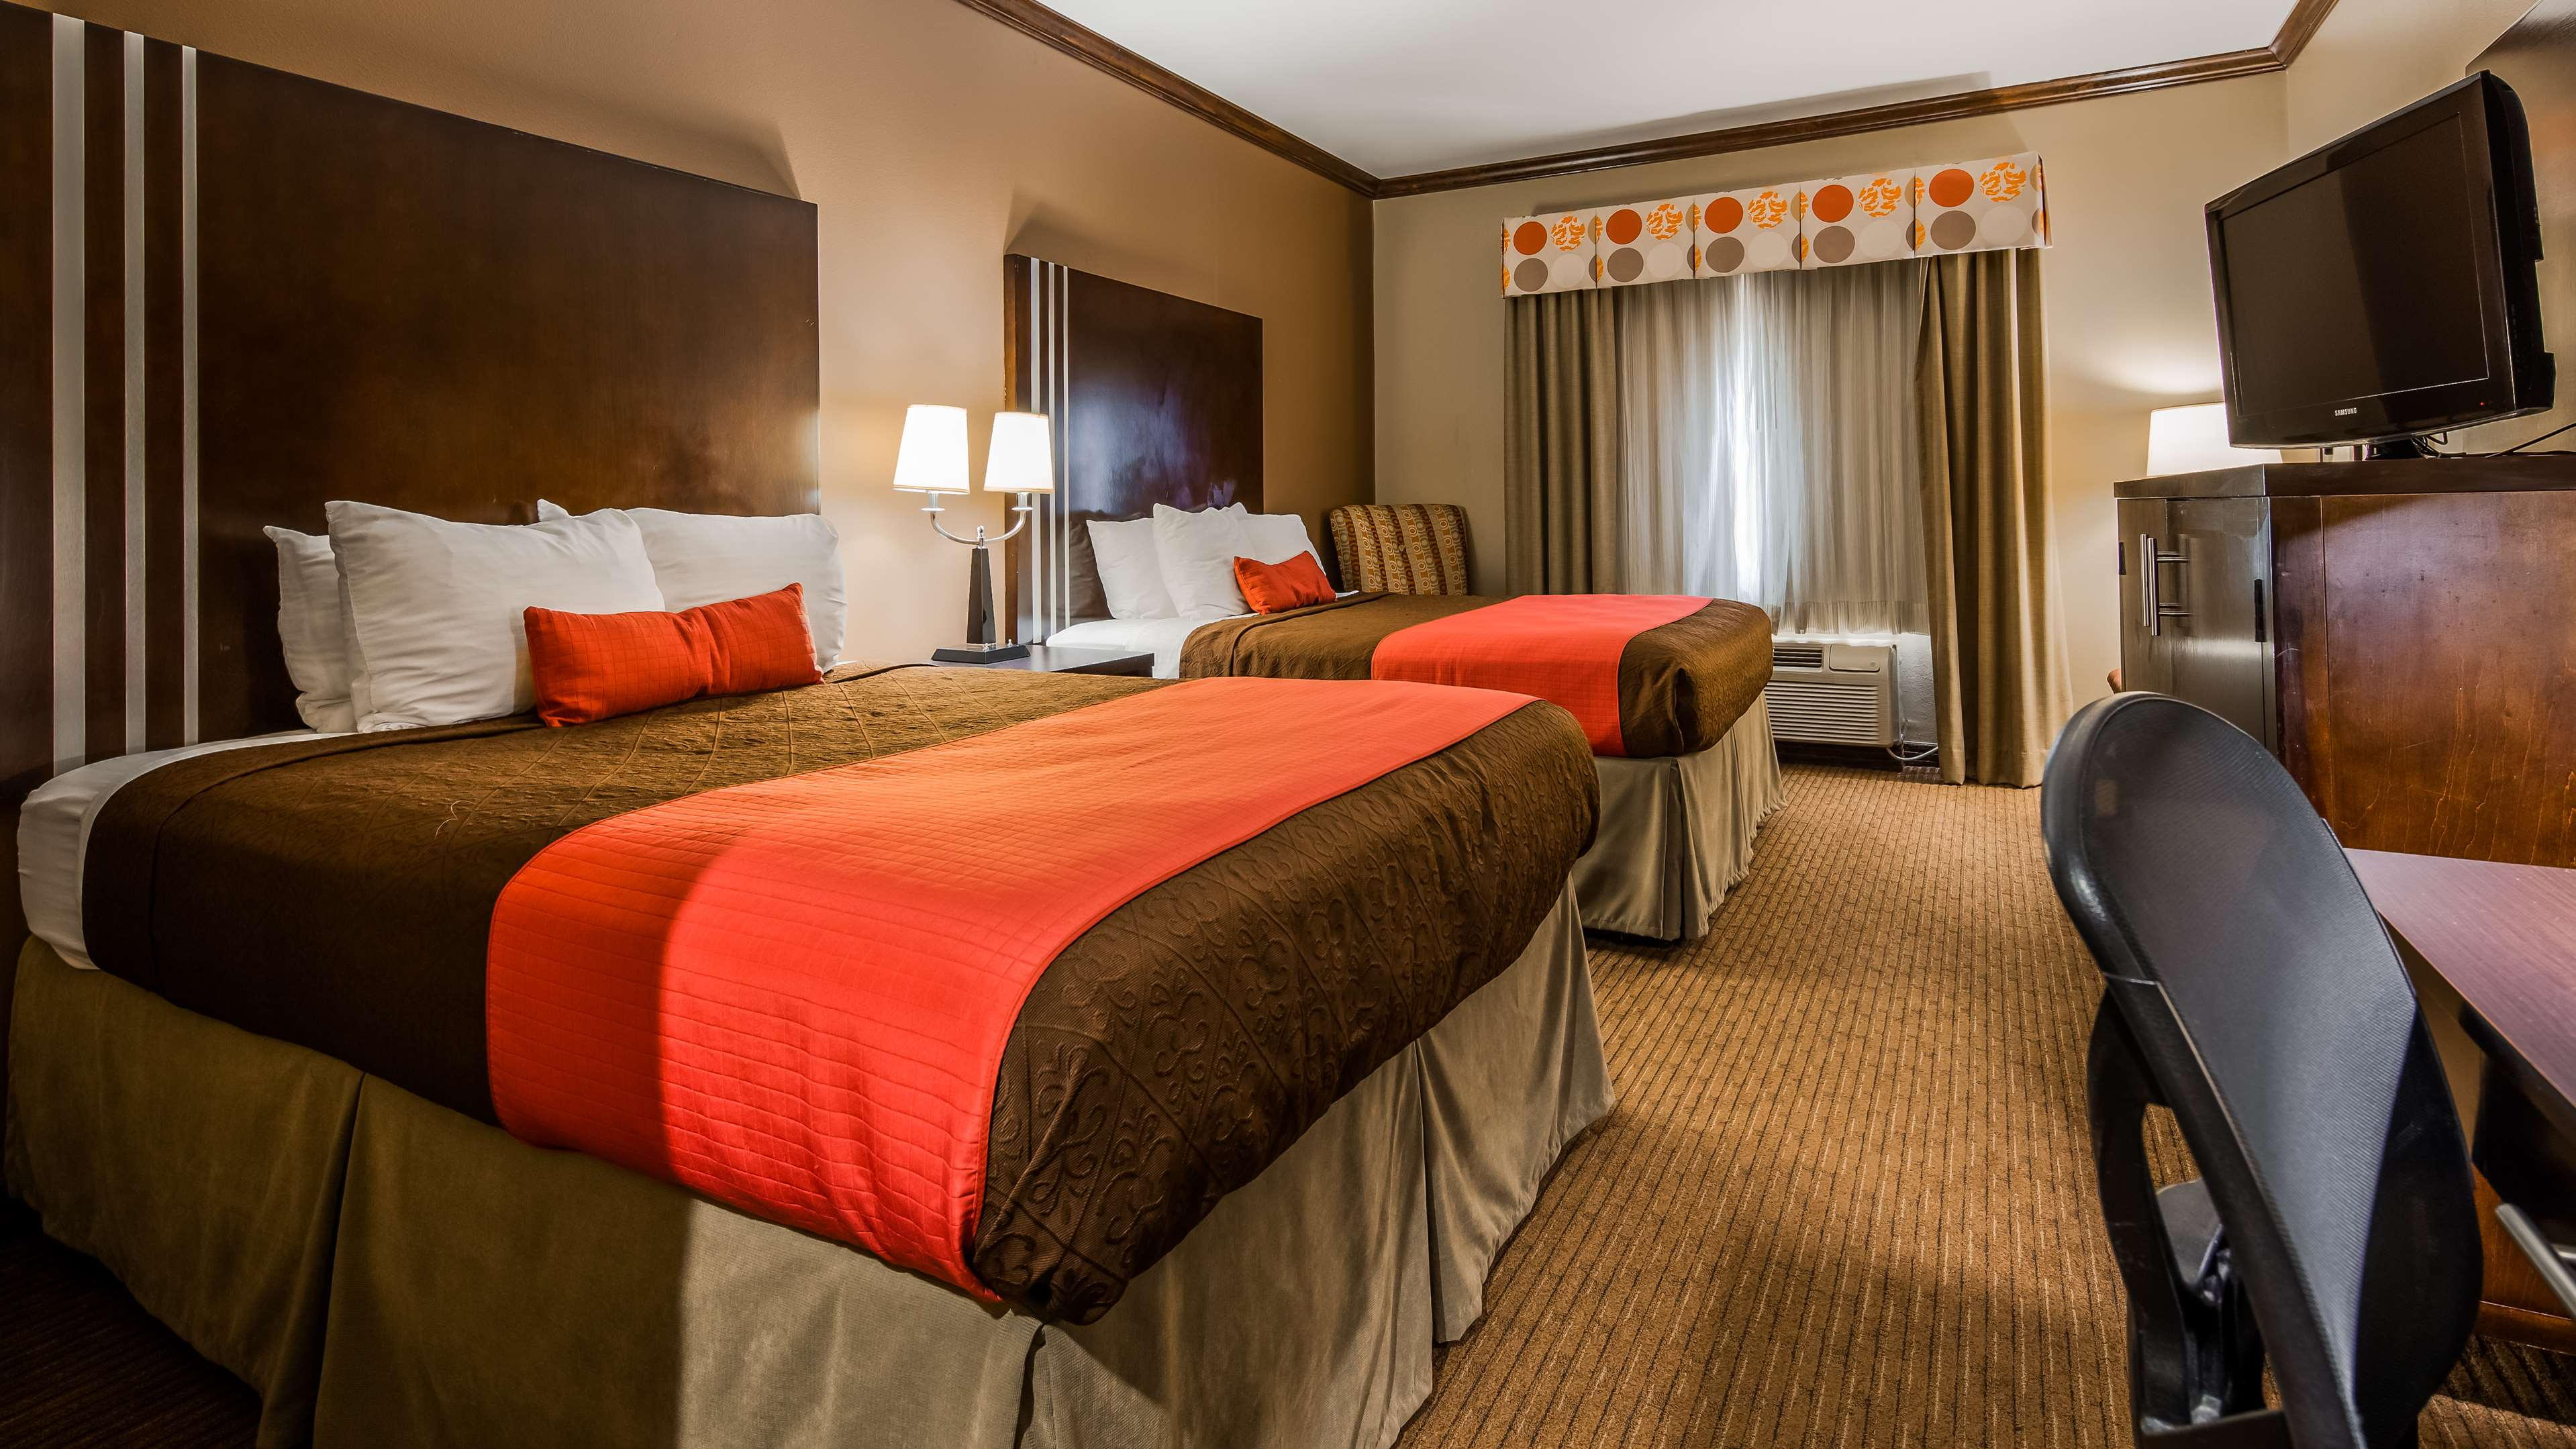 Best Western Plus Texoma Hotel & Suites image 23